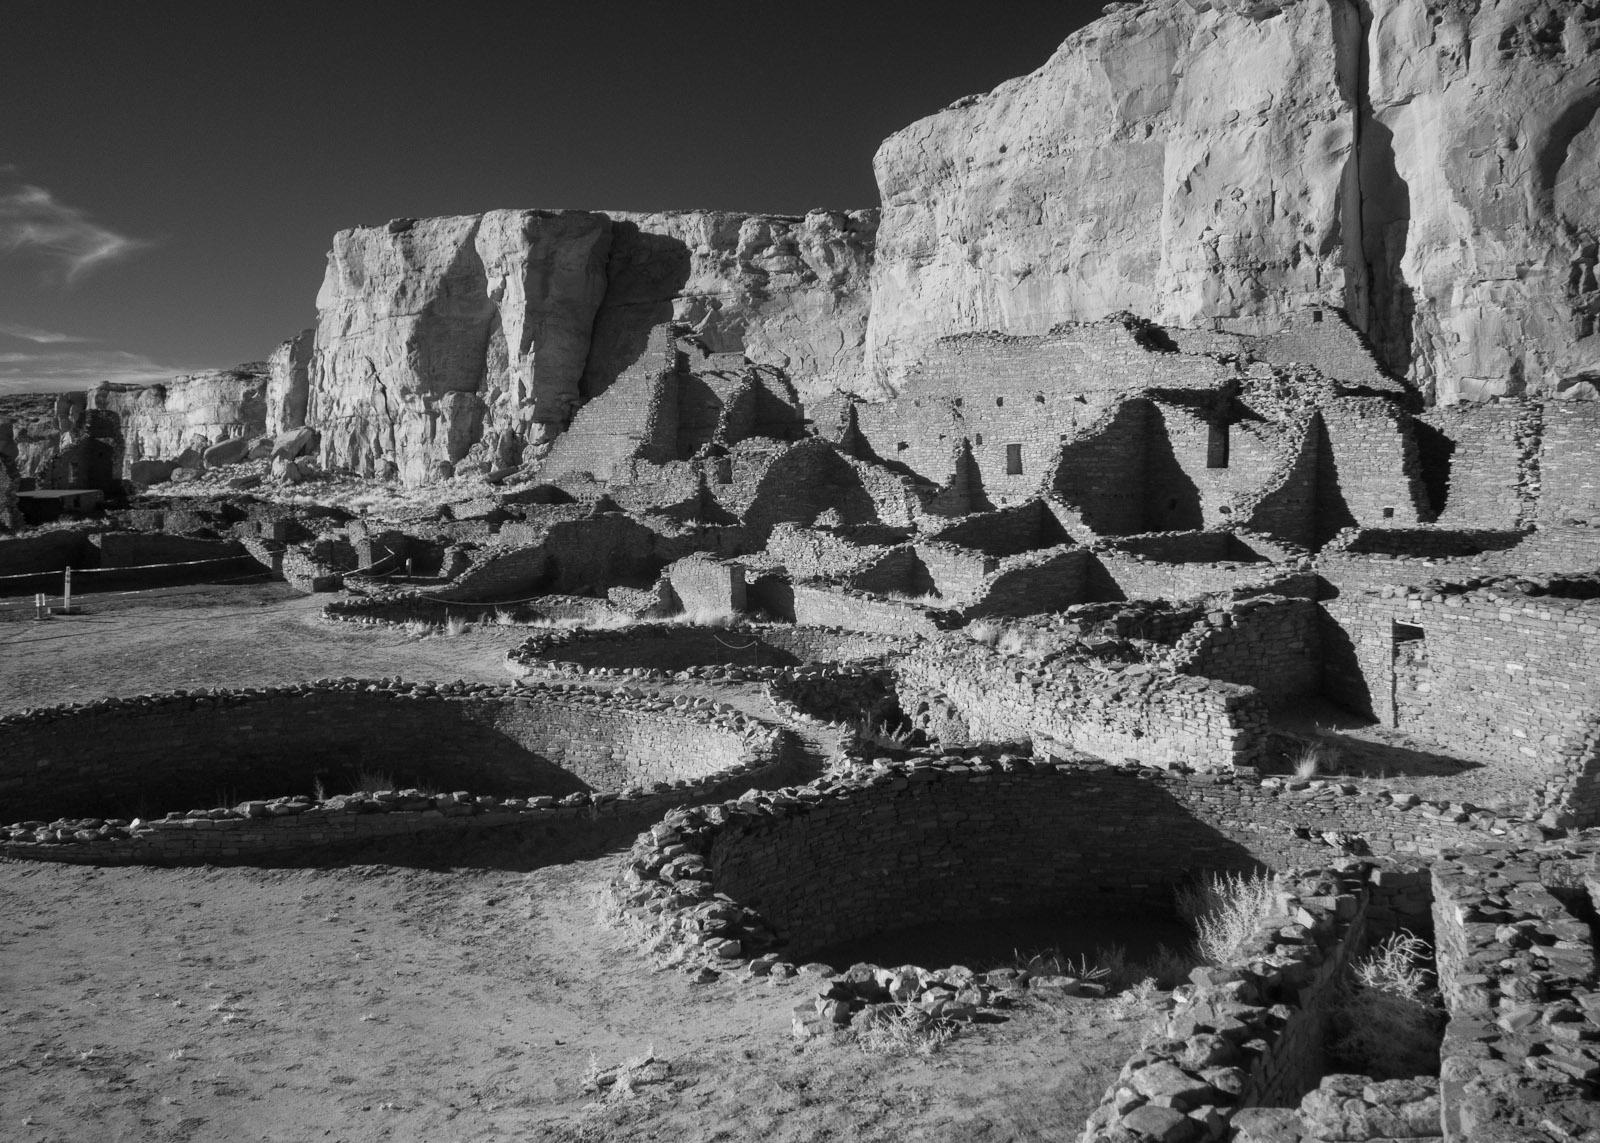 Chaco Canyon National Historic Park, Pueblo Bonito, Author: Greg Willis, from Denver, Colorado, USA, Wikimedia Commons.